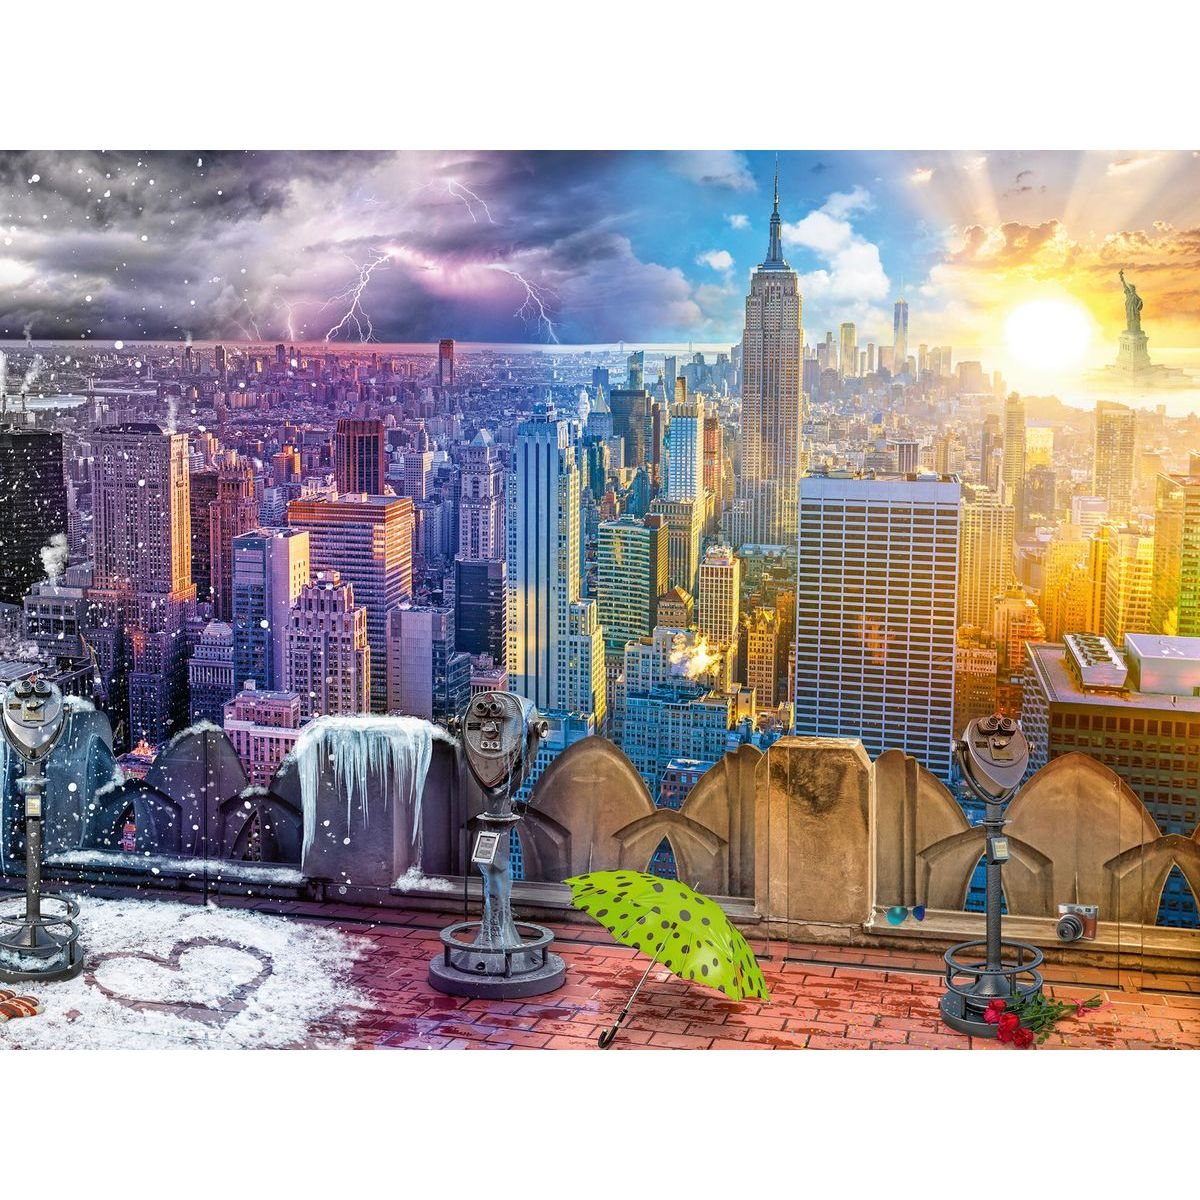 Ravensburger puzzle 160082 Mrakodrapy New Yorku 1500 dielikov